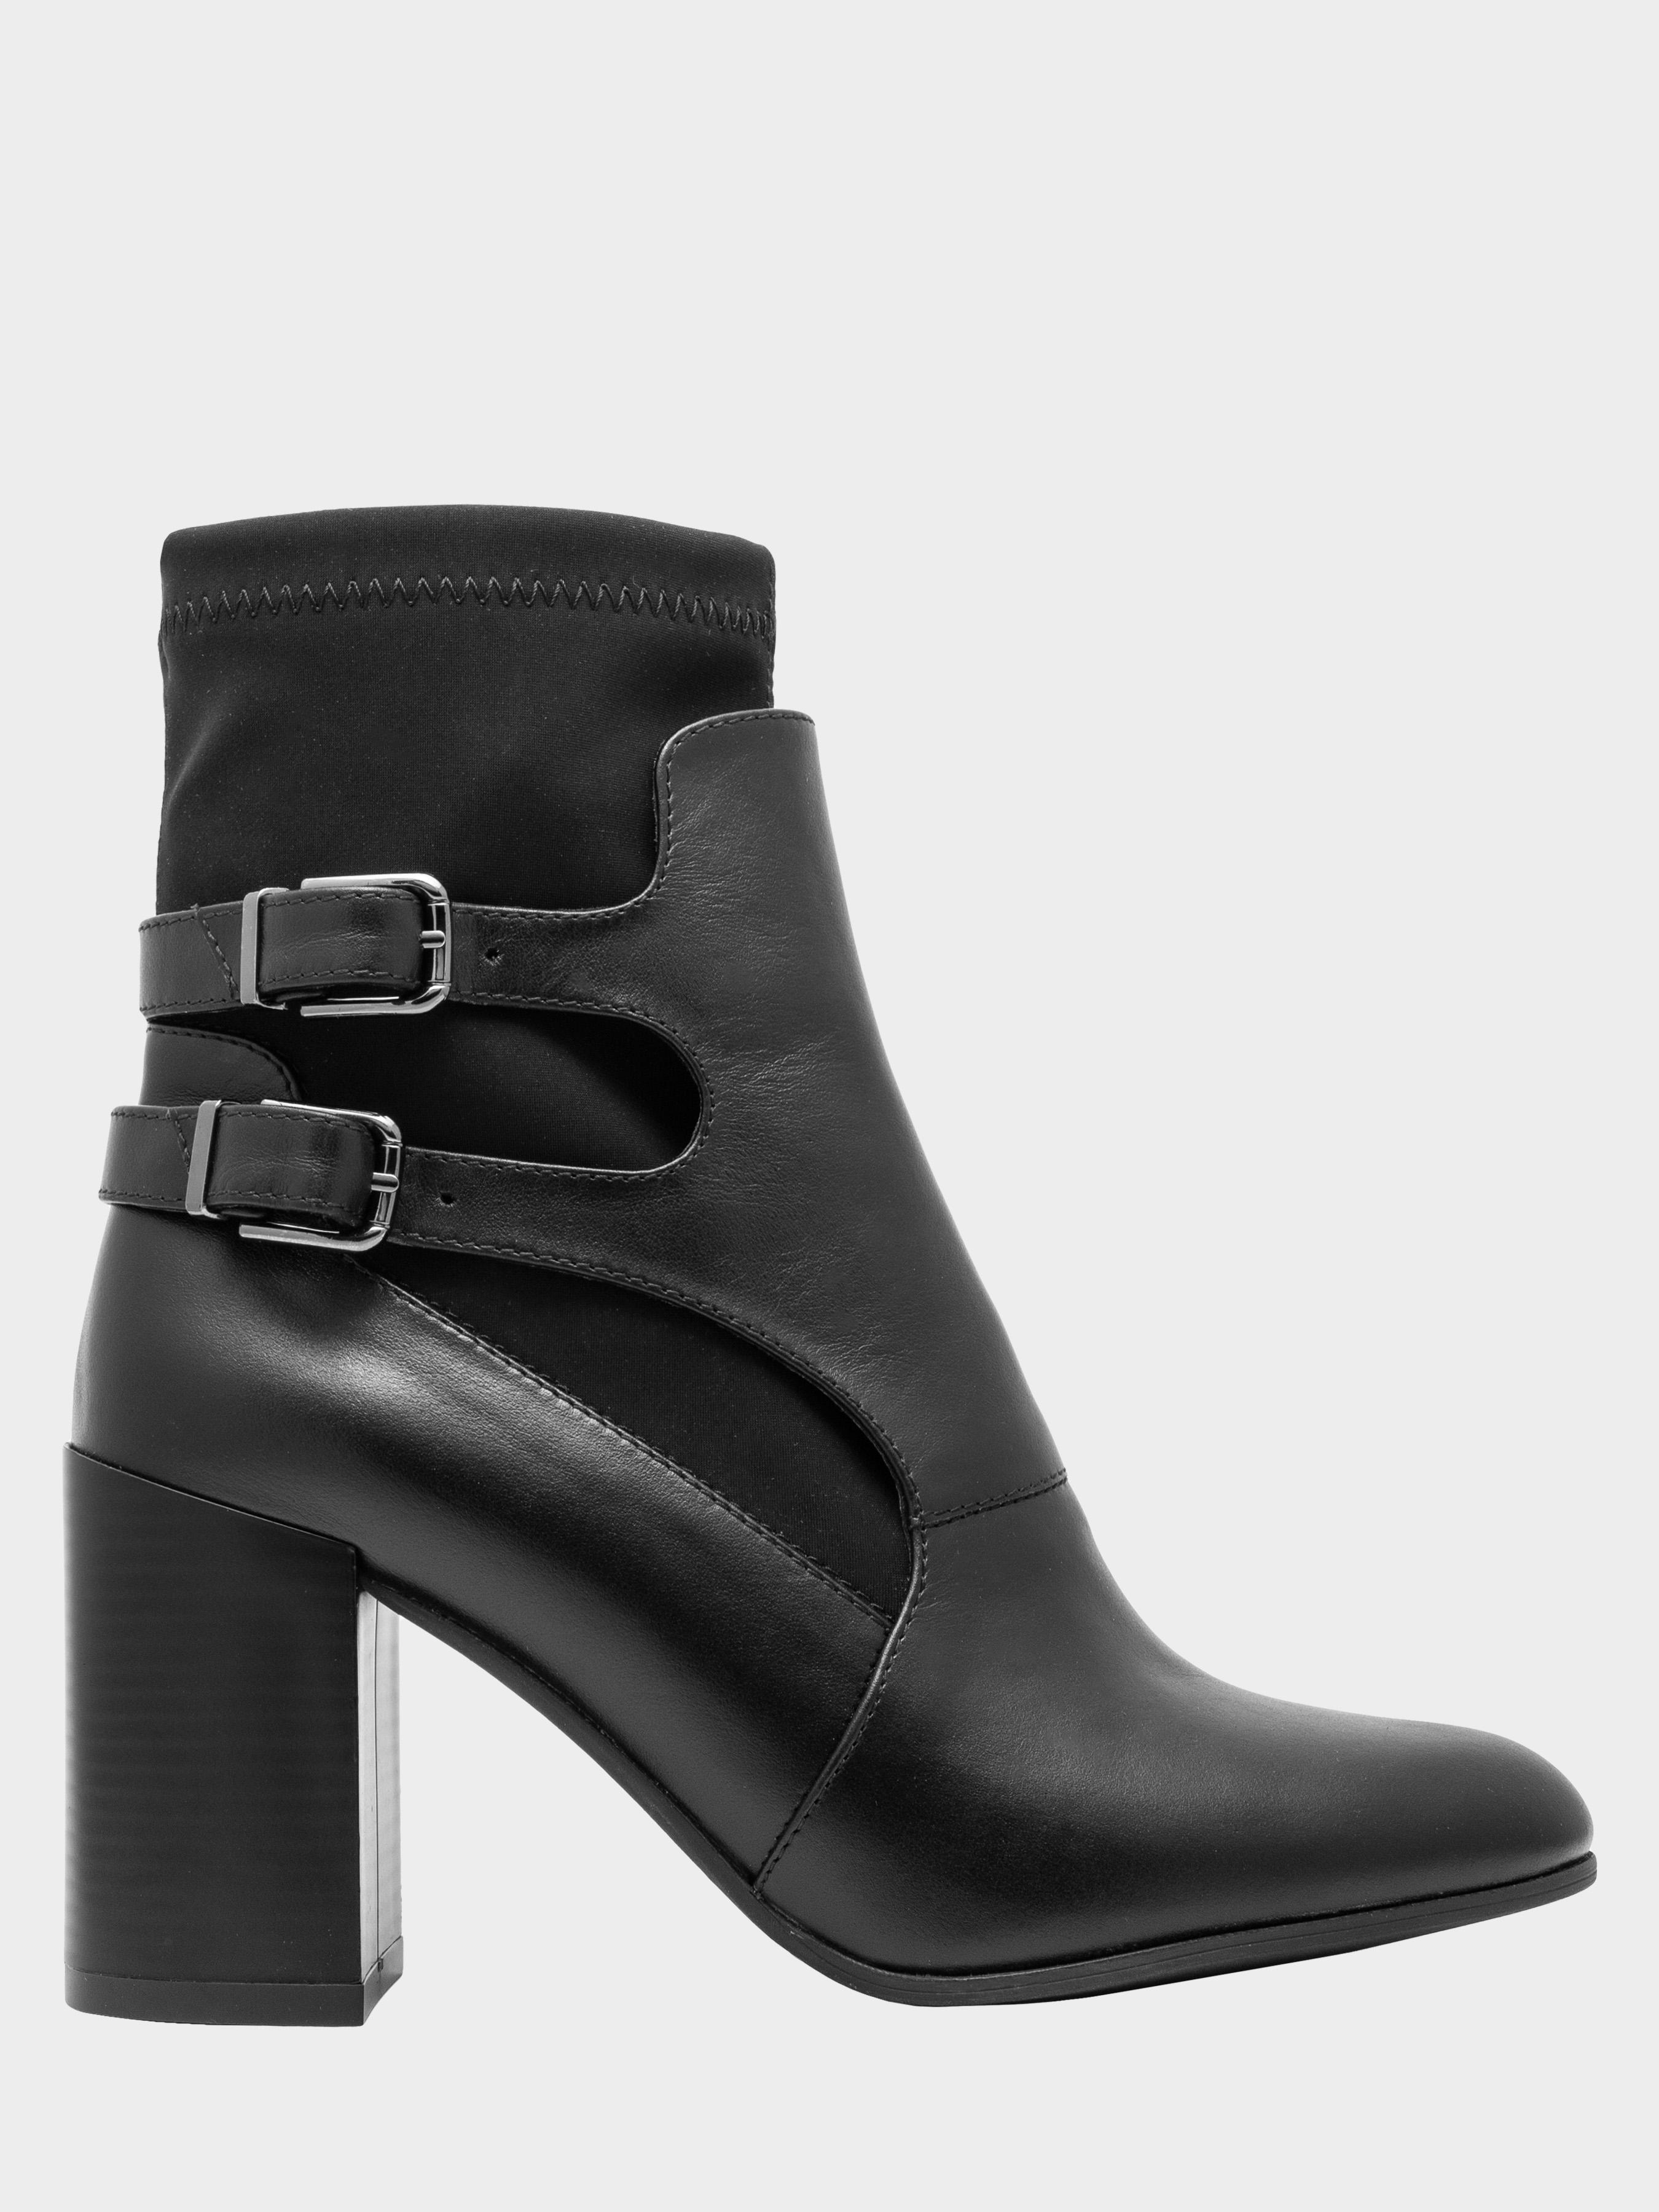 Ботинки для женщин Ботинки женские ENZO VERRATTI 18-9588bl продажа, 2017